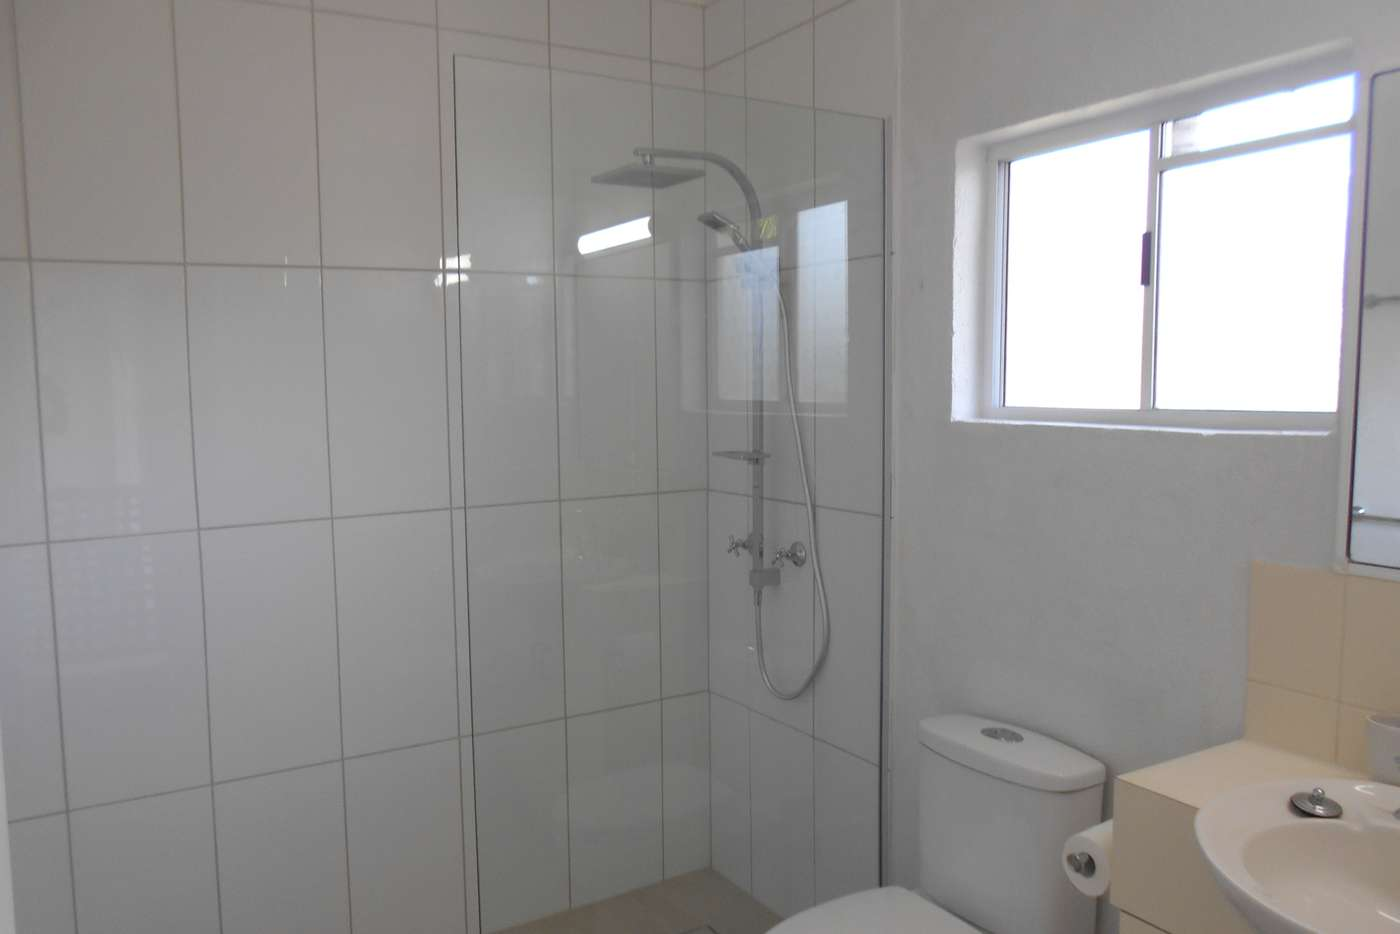 Sixth view of Homely apartment listing, Villa 143 Reef Resort 121 Port Douglas Rd, Port Douglas QLD 4877